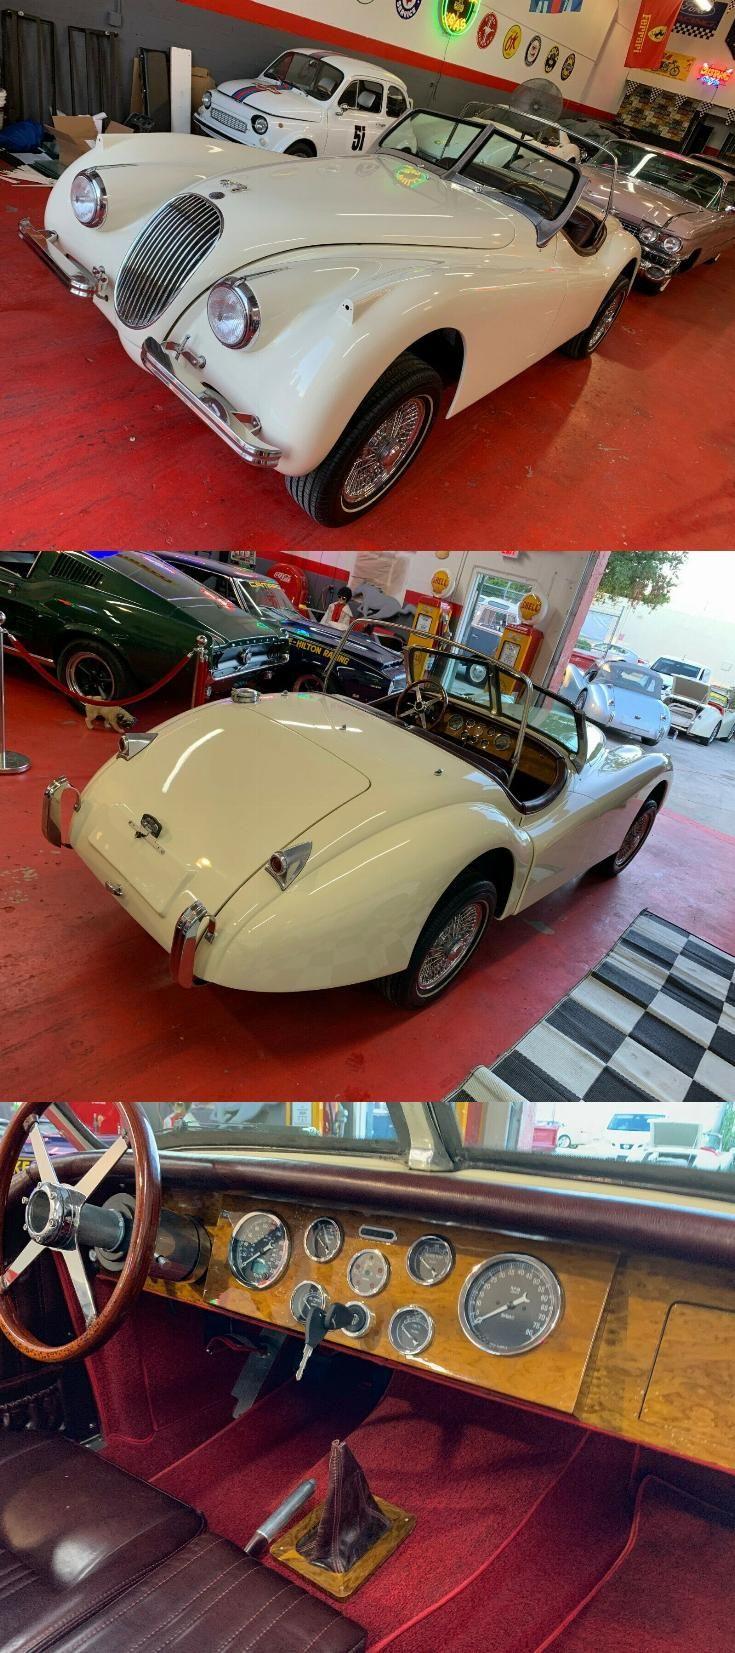 Restomod 1951 Jaguar Xk120 Replica   Jaguar xk120, Jaguar ...